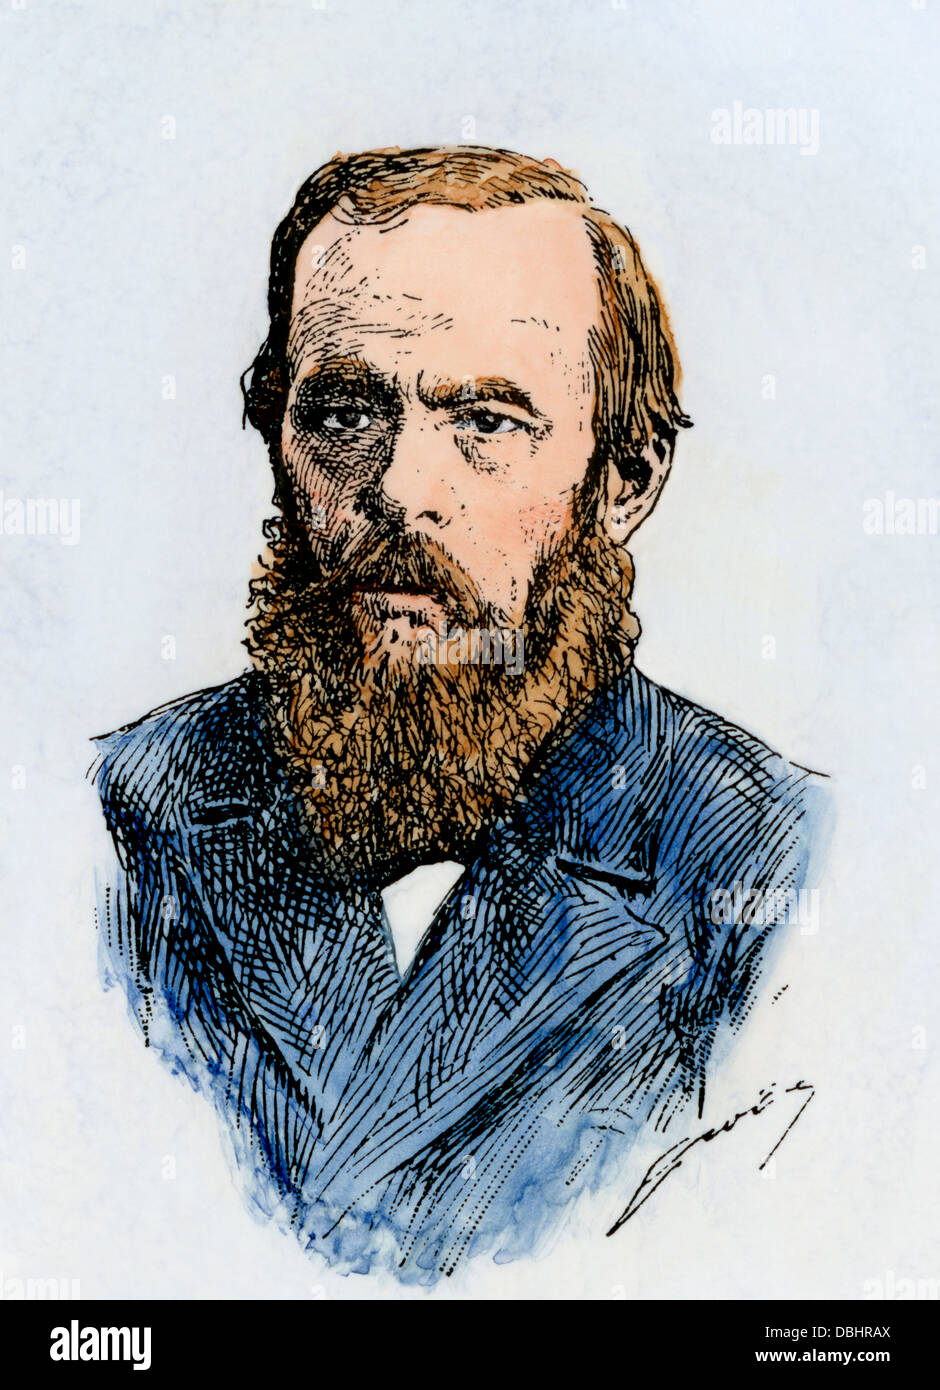 Russian novelist Fyodor Dostoyevsky. Hand-colored woodcut - Stock Image